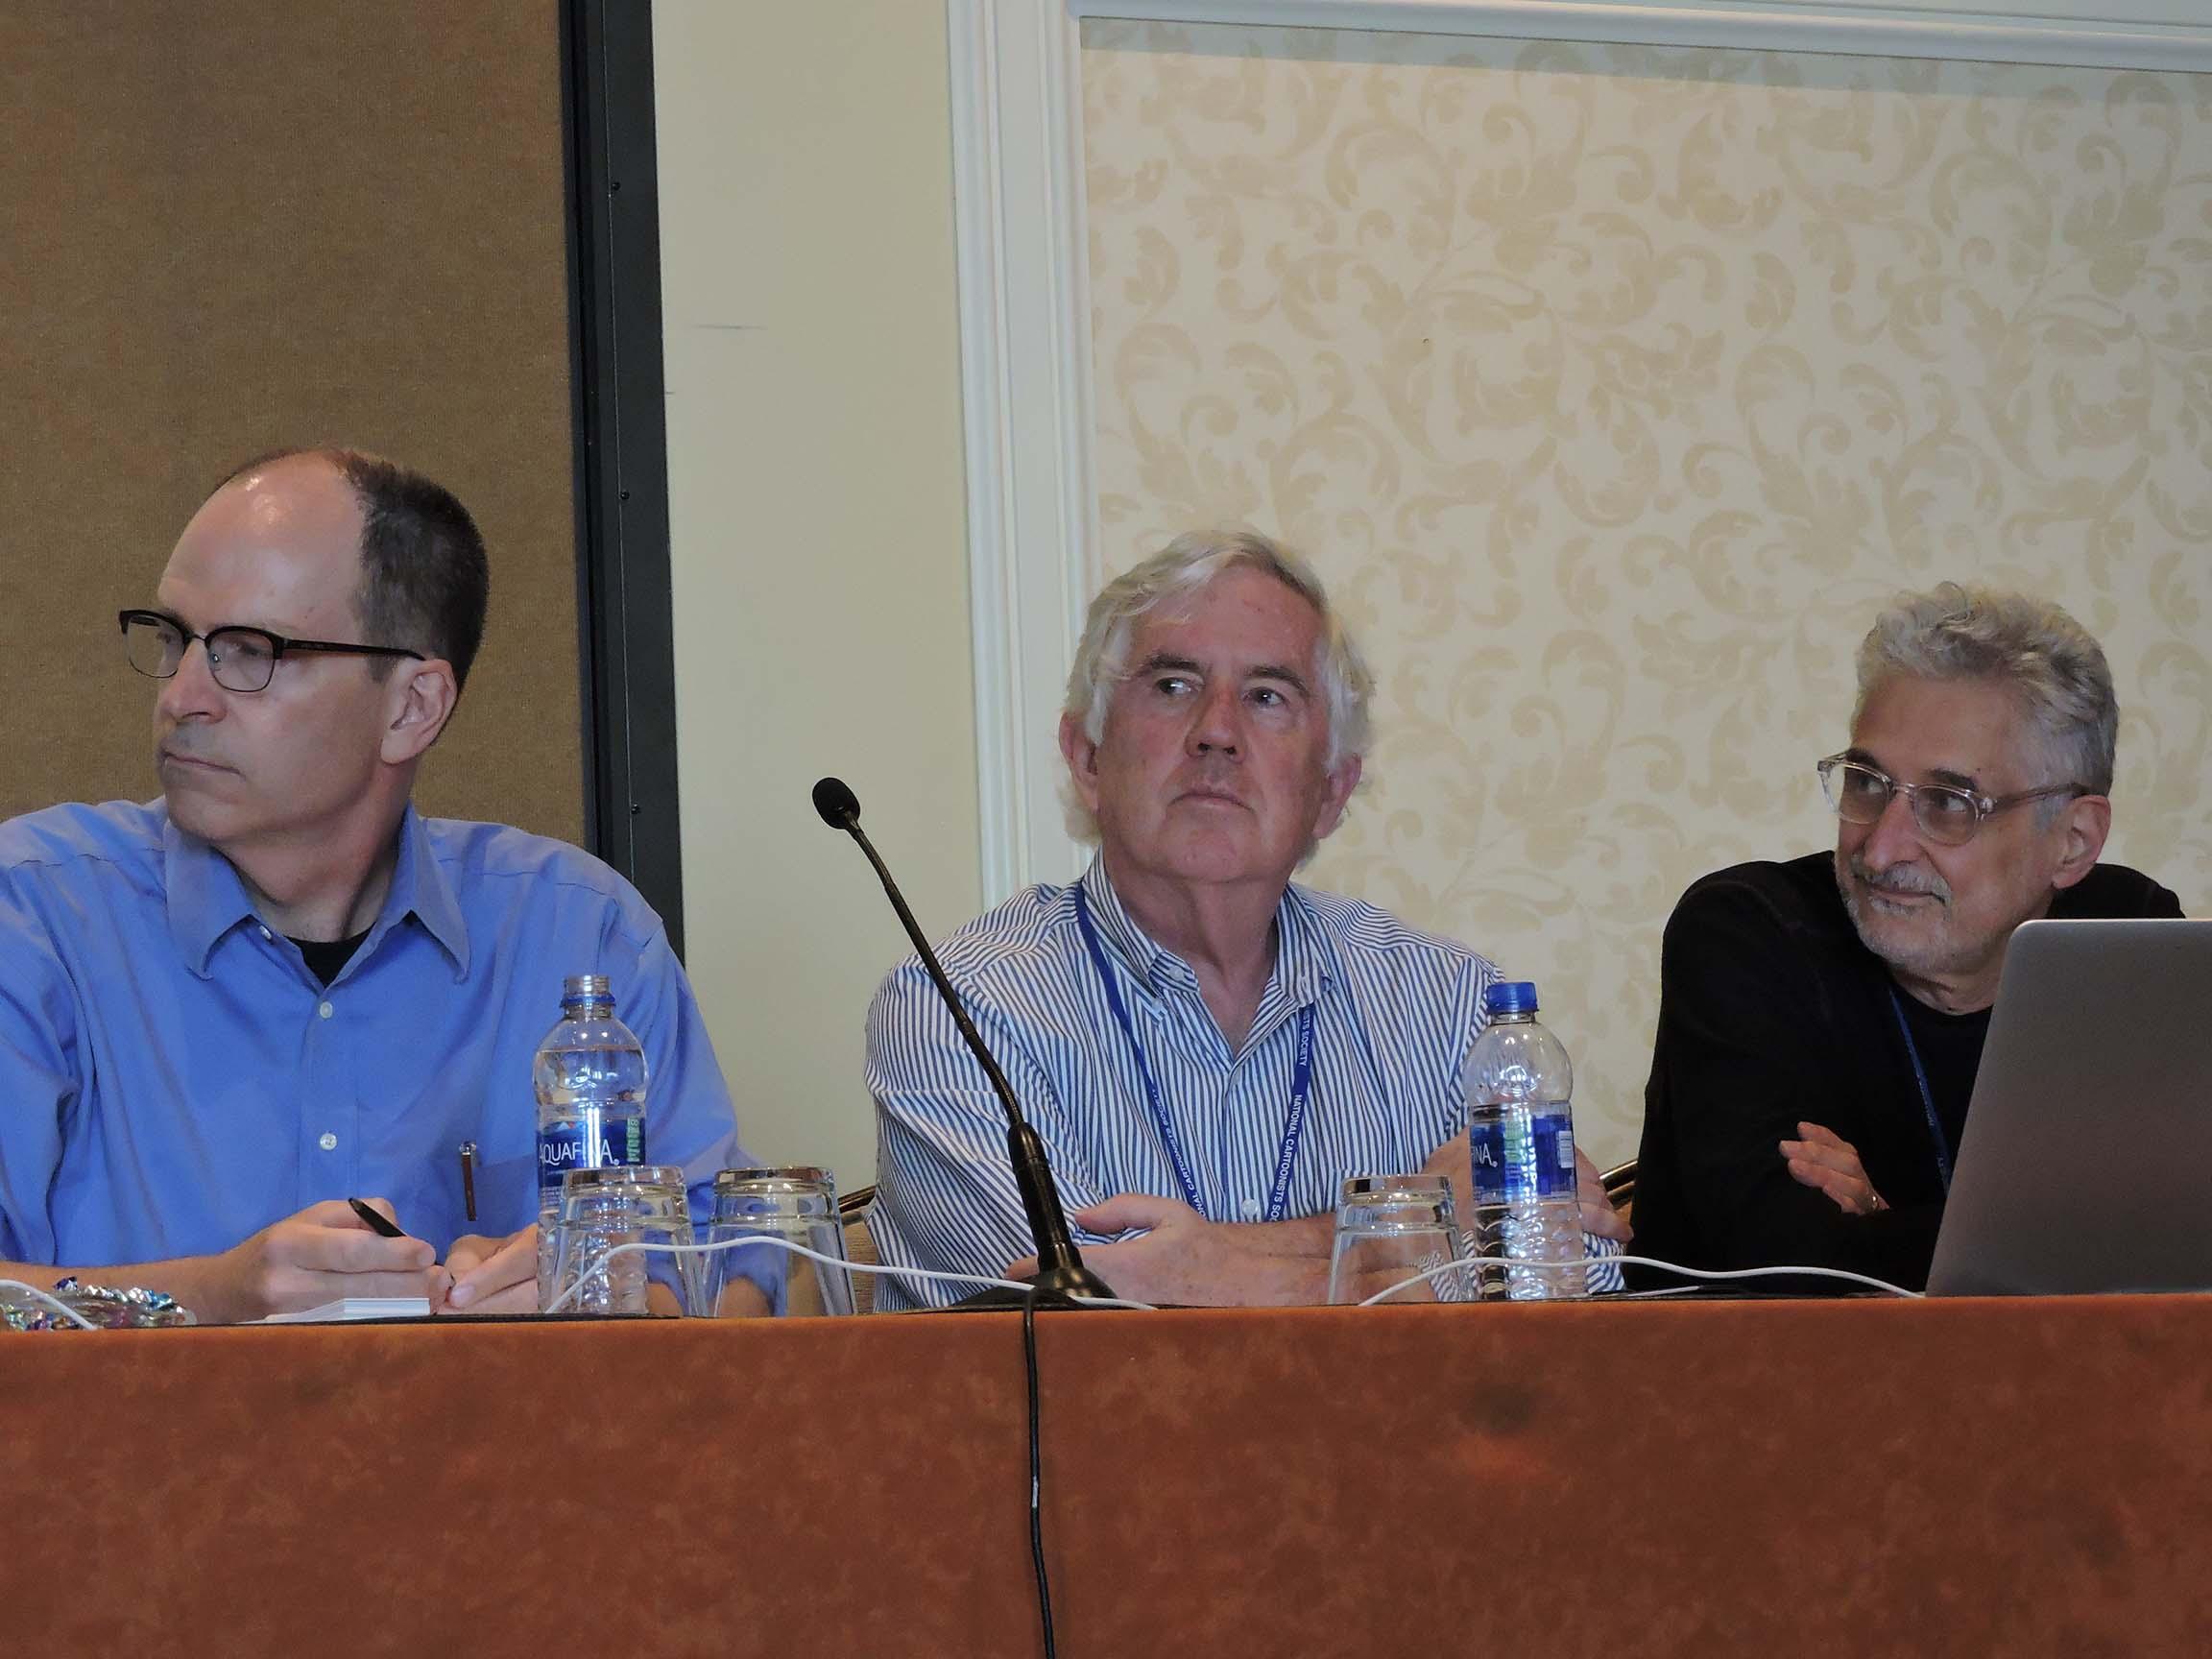 Michael Tisserand, Brian Walker and Patrick McDonnell (l-r)...